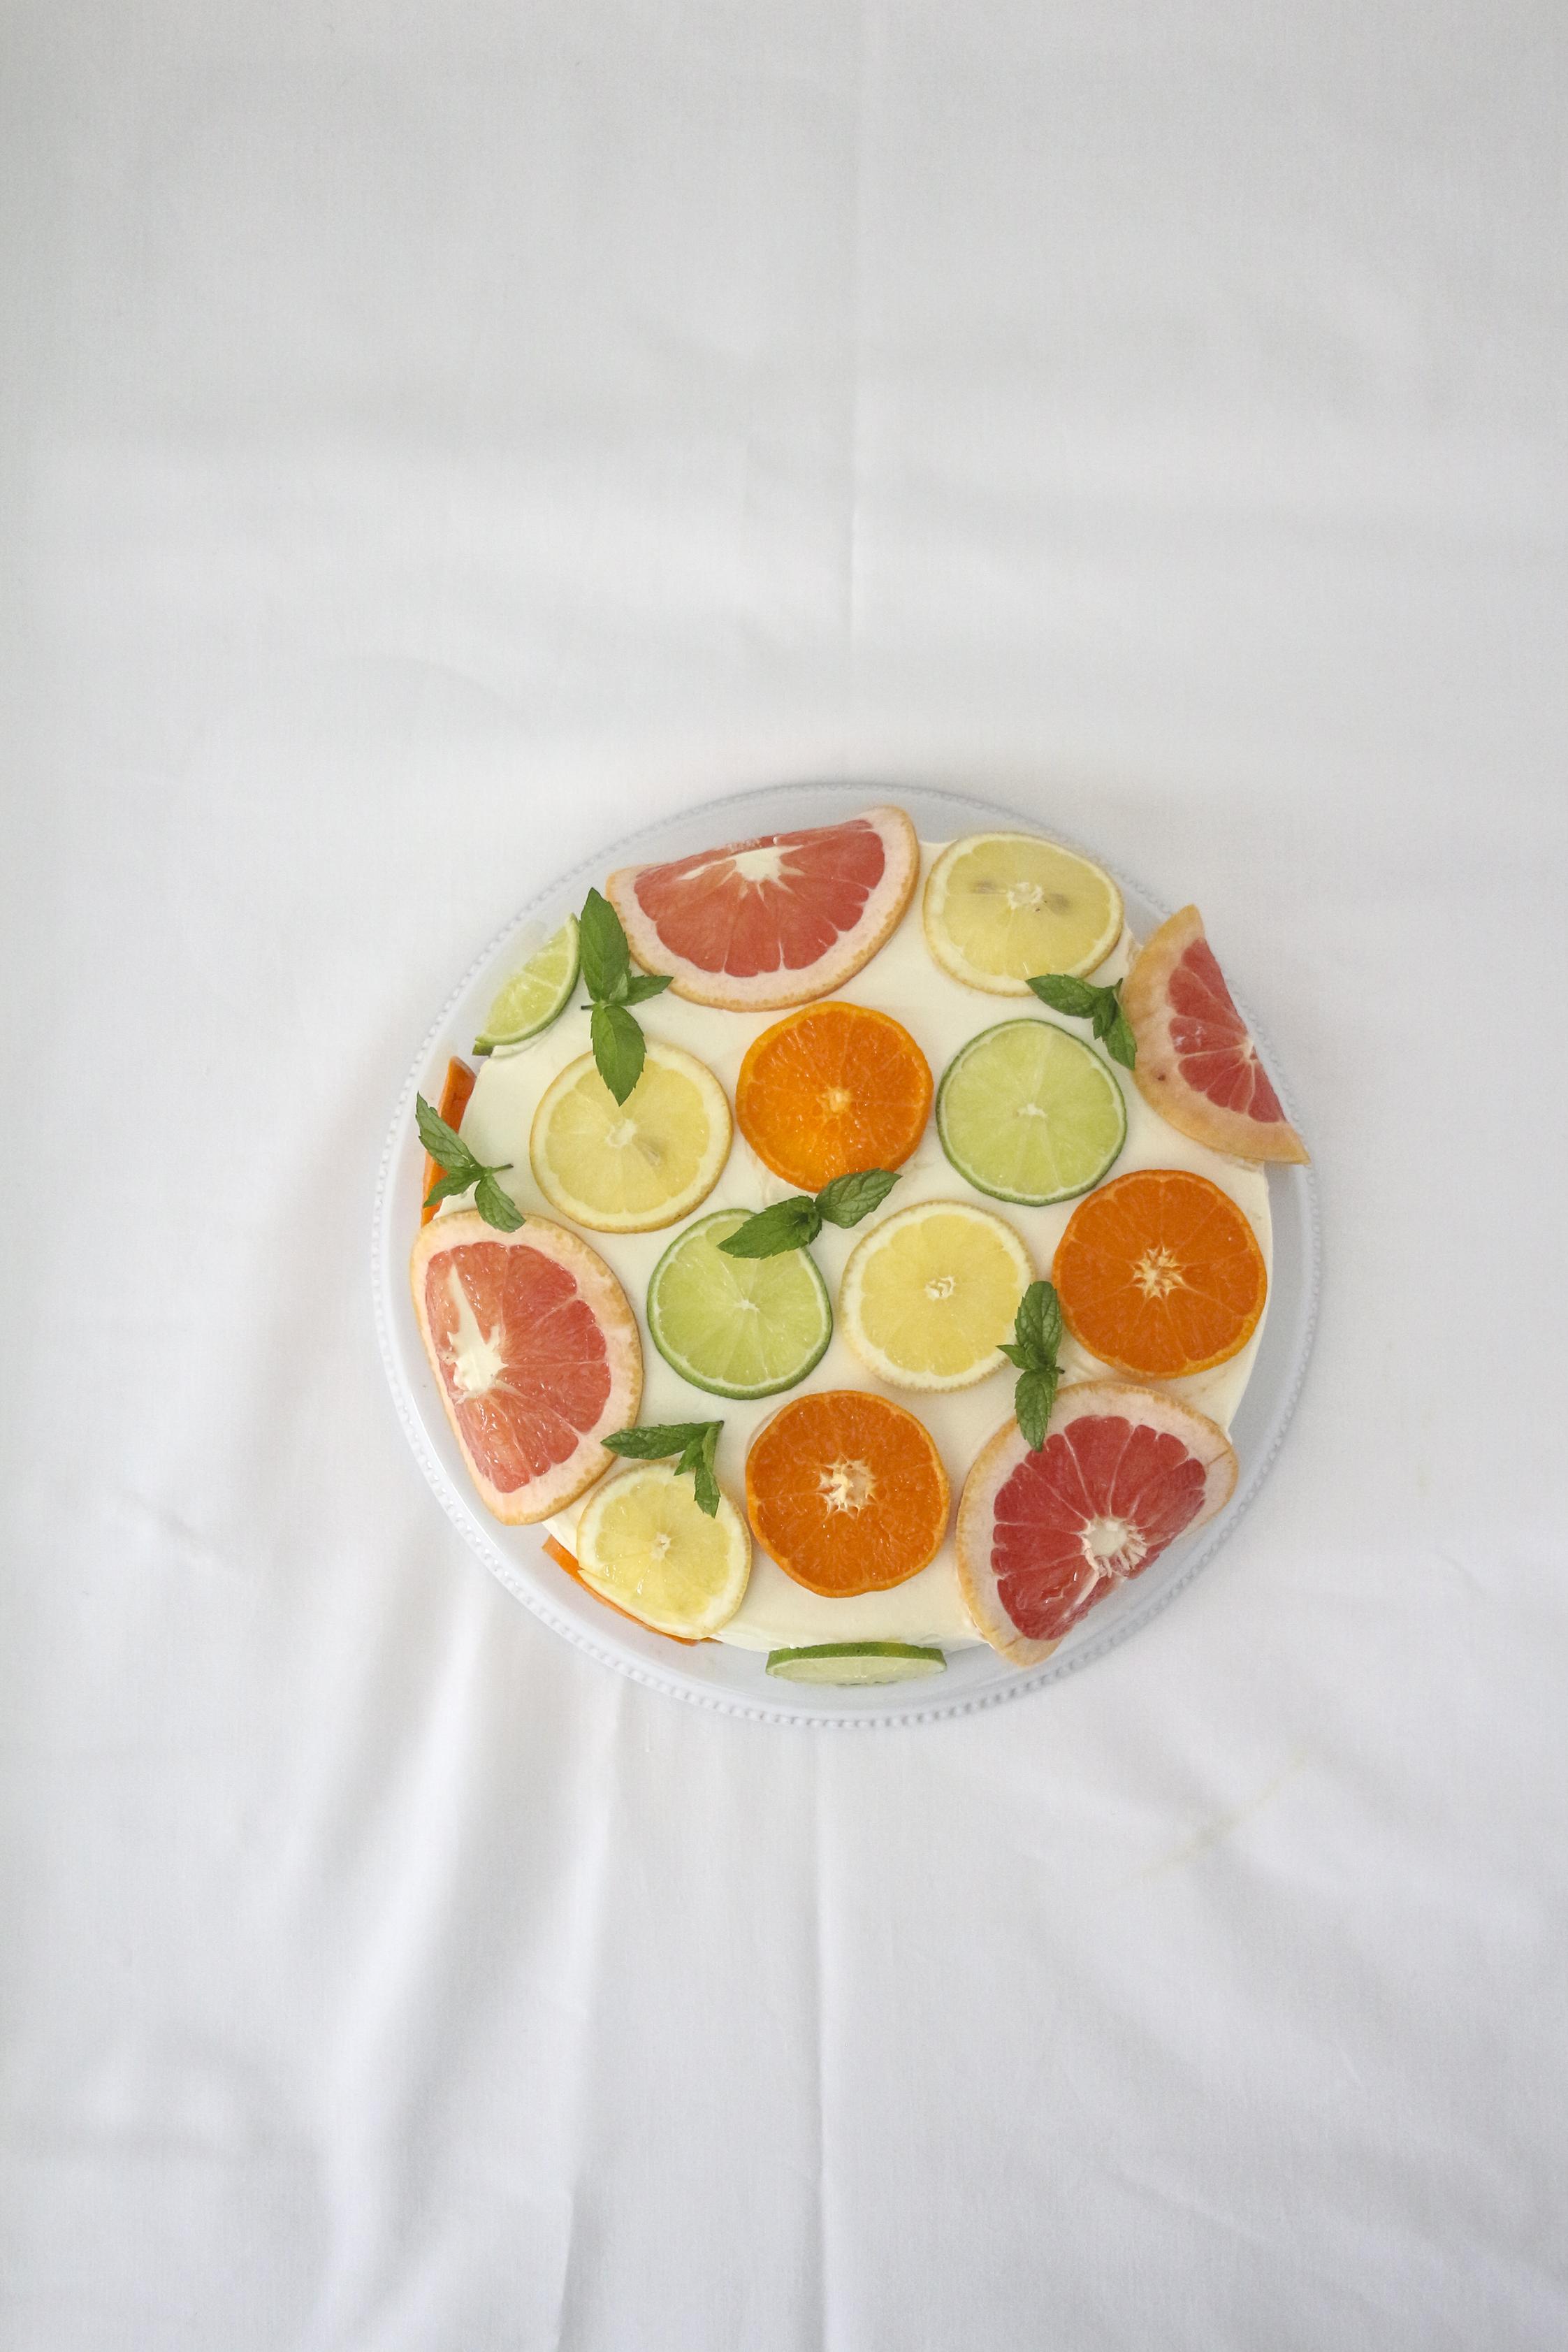 Coconut Cake with Citrus10